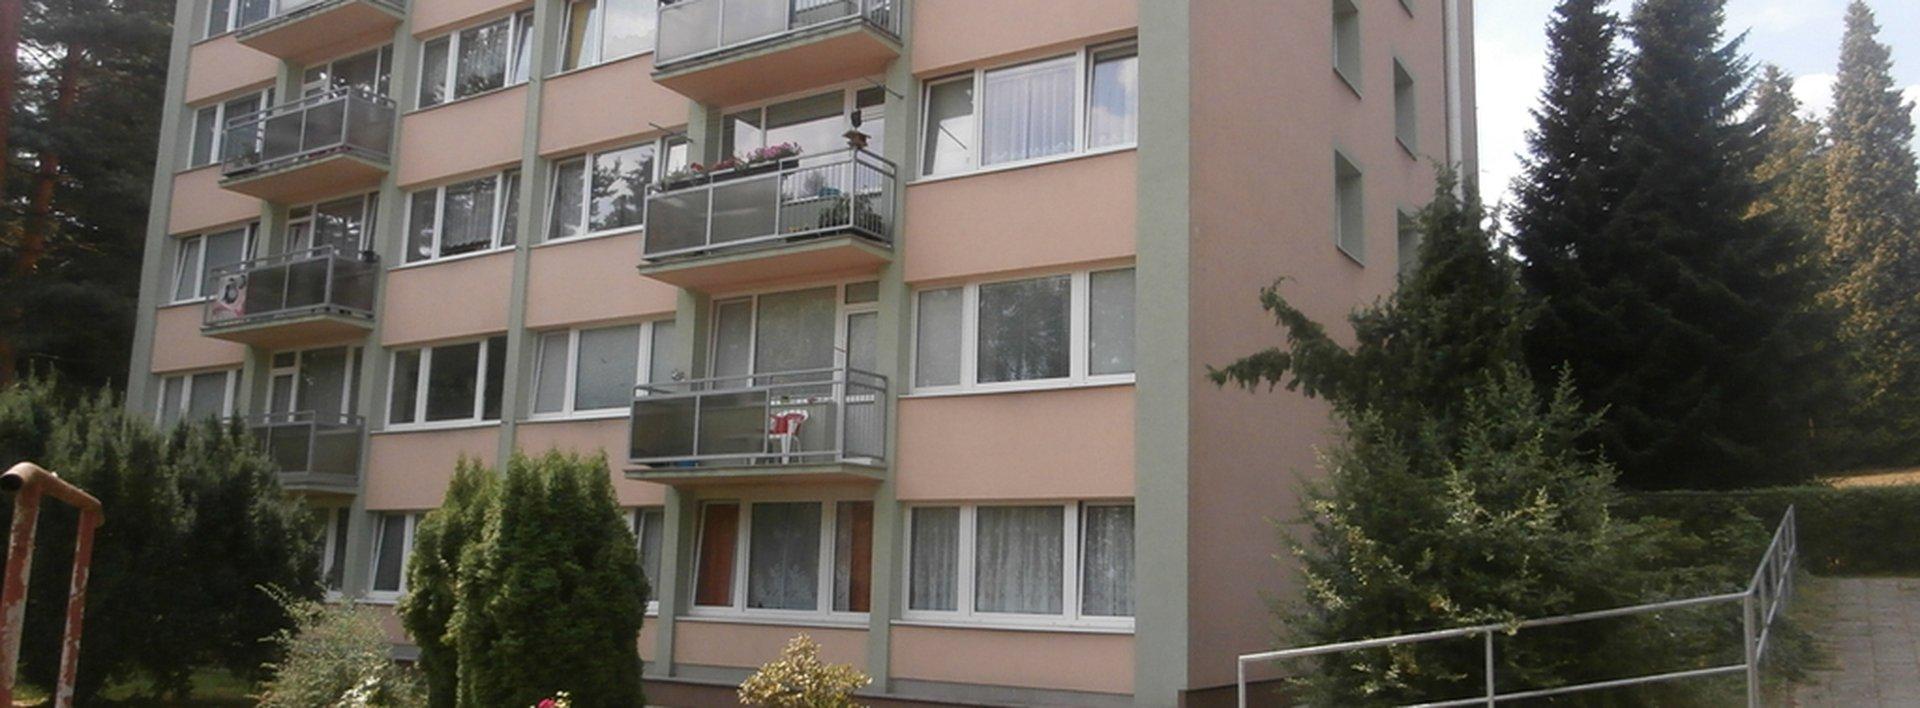 Prodej útulného bytu 2+1 v Růžodole, Ev.č.: N47097